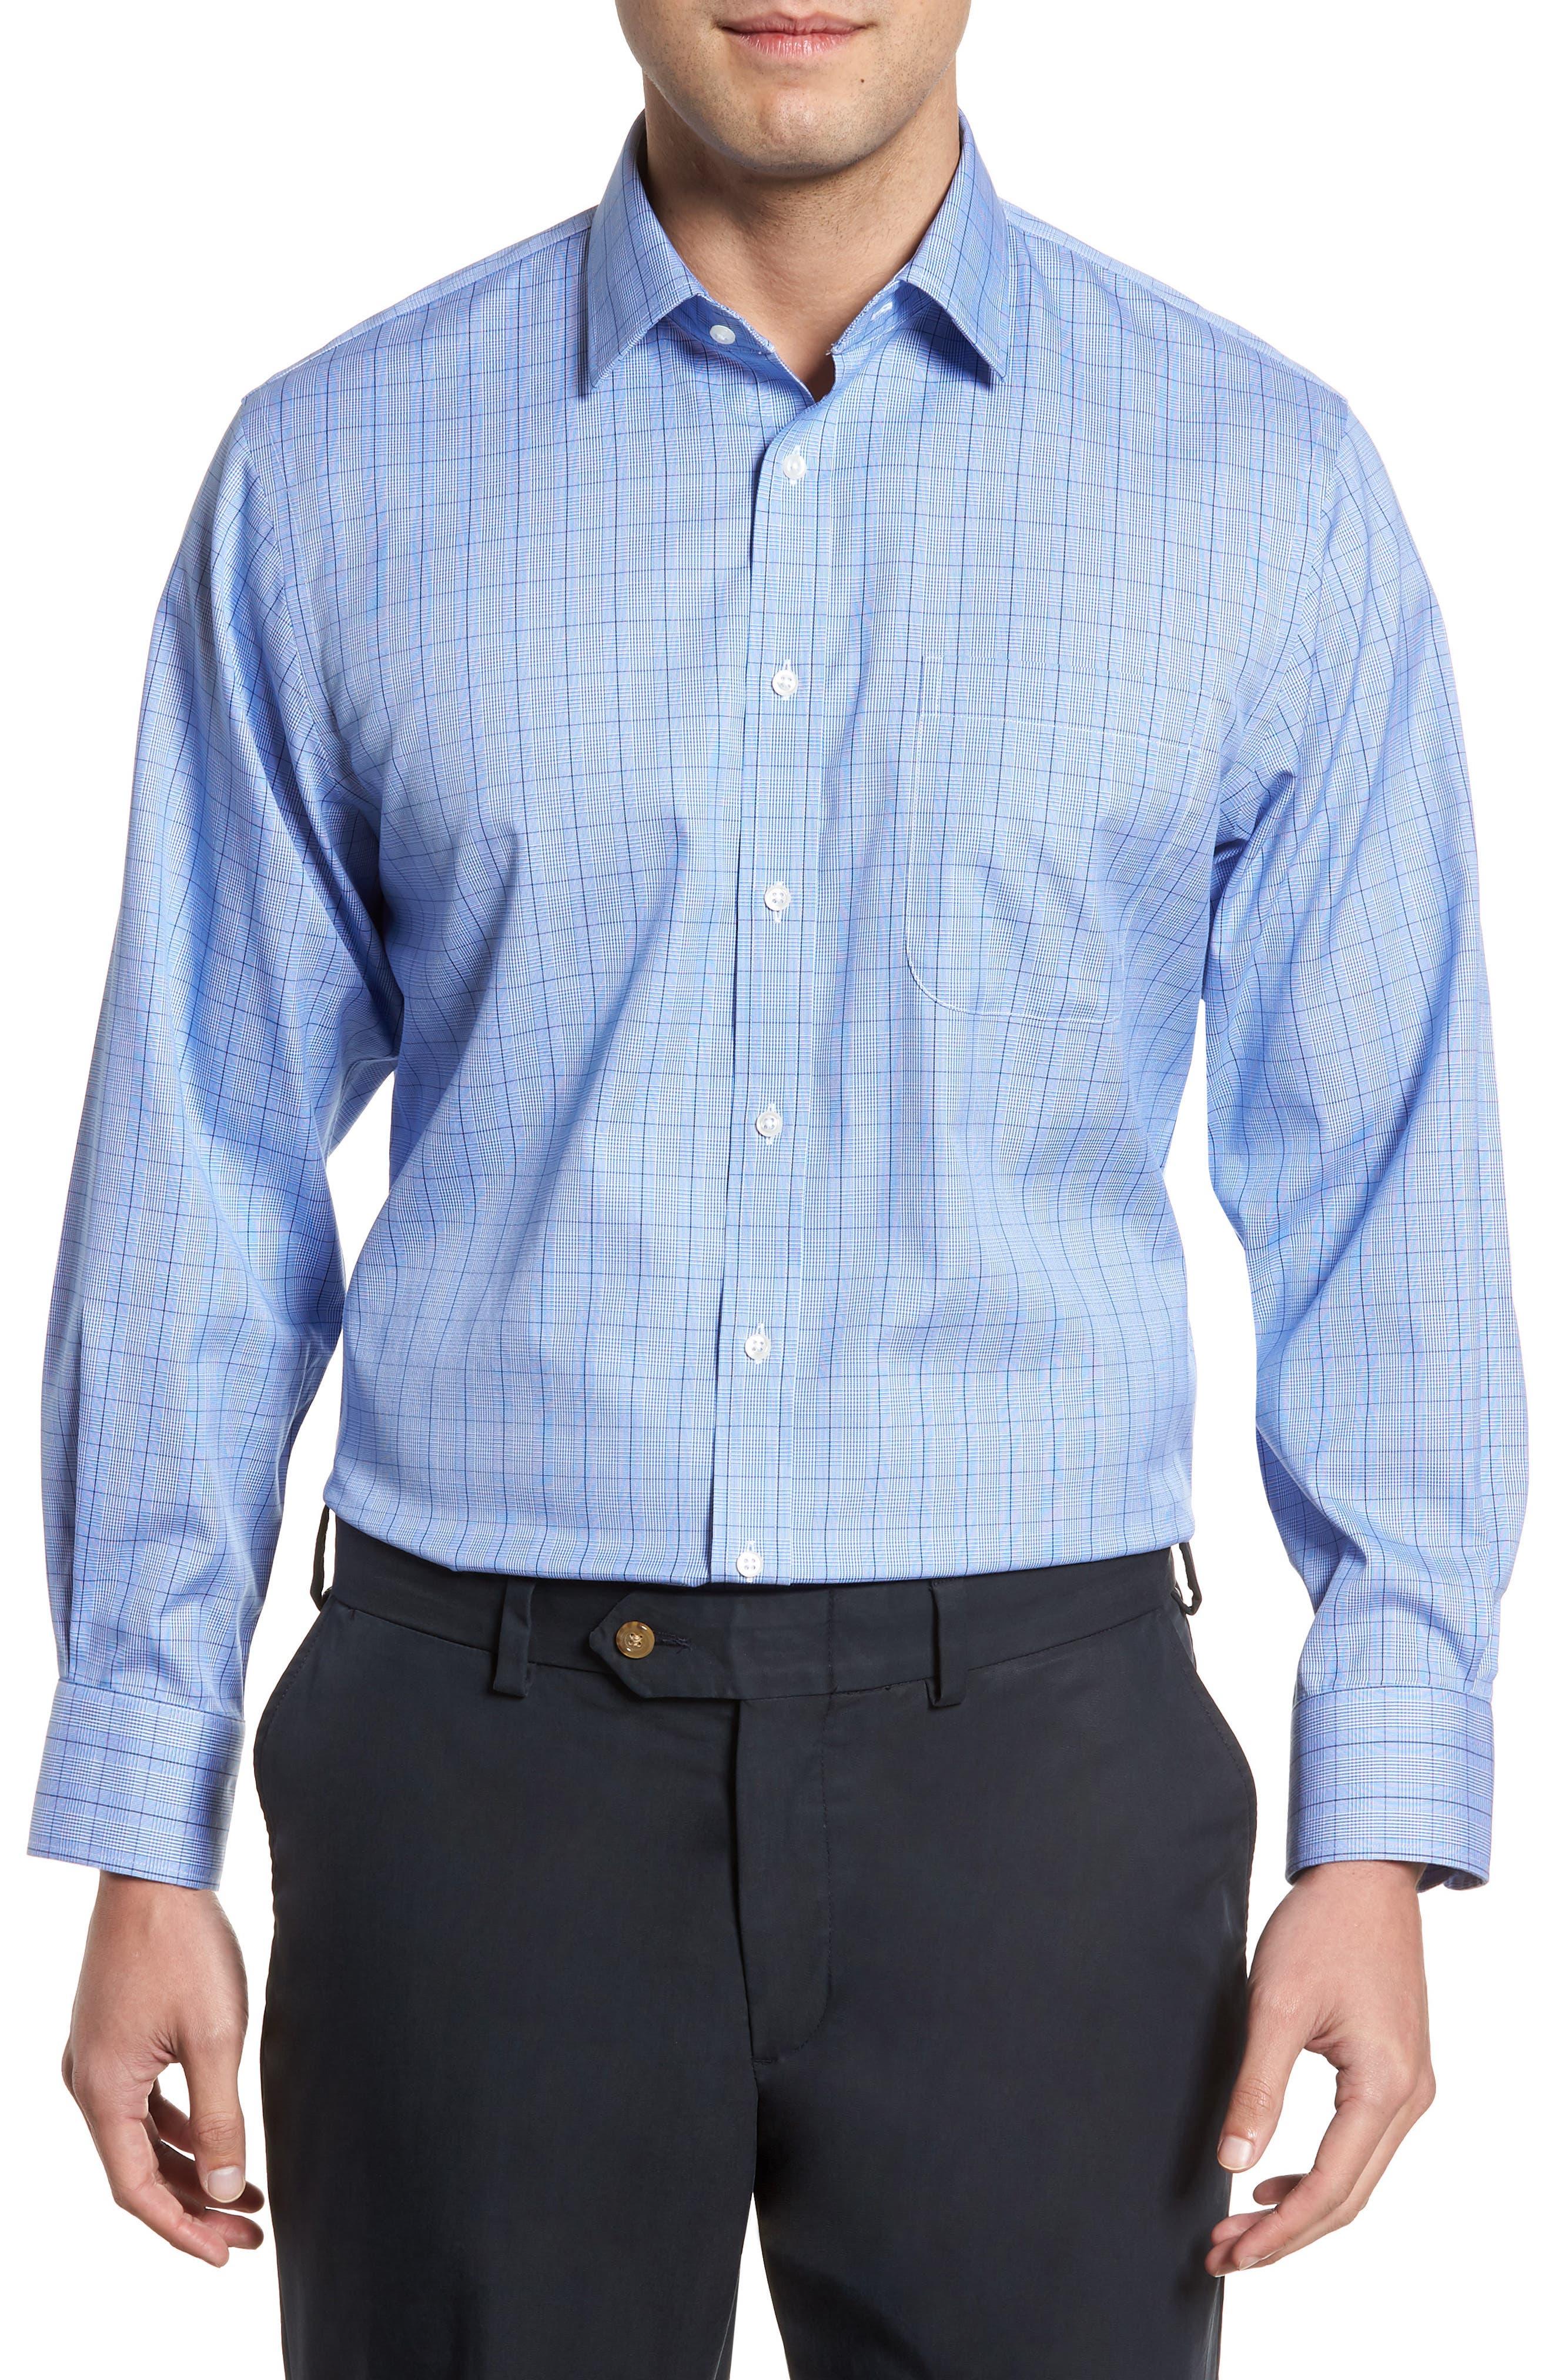 Main Image - Nordstrom Men's Shop Smartcare™ Traditional Fit Windowpane Dress Shirt